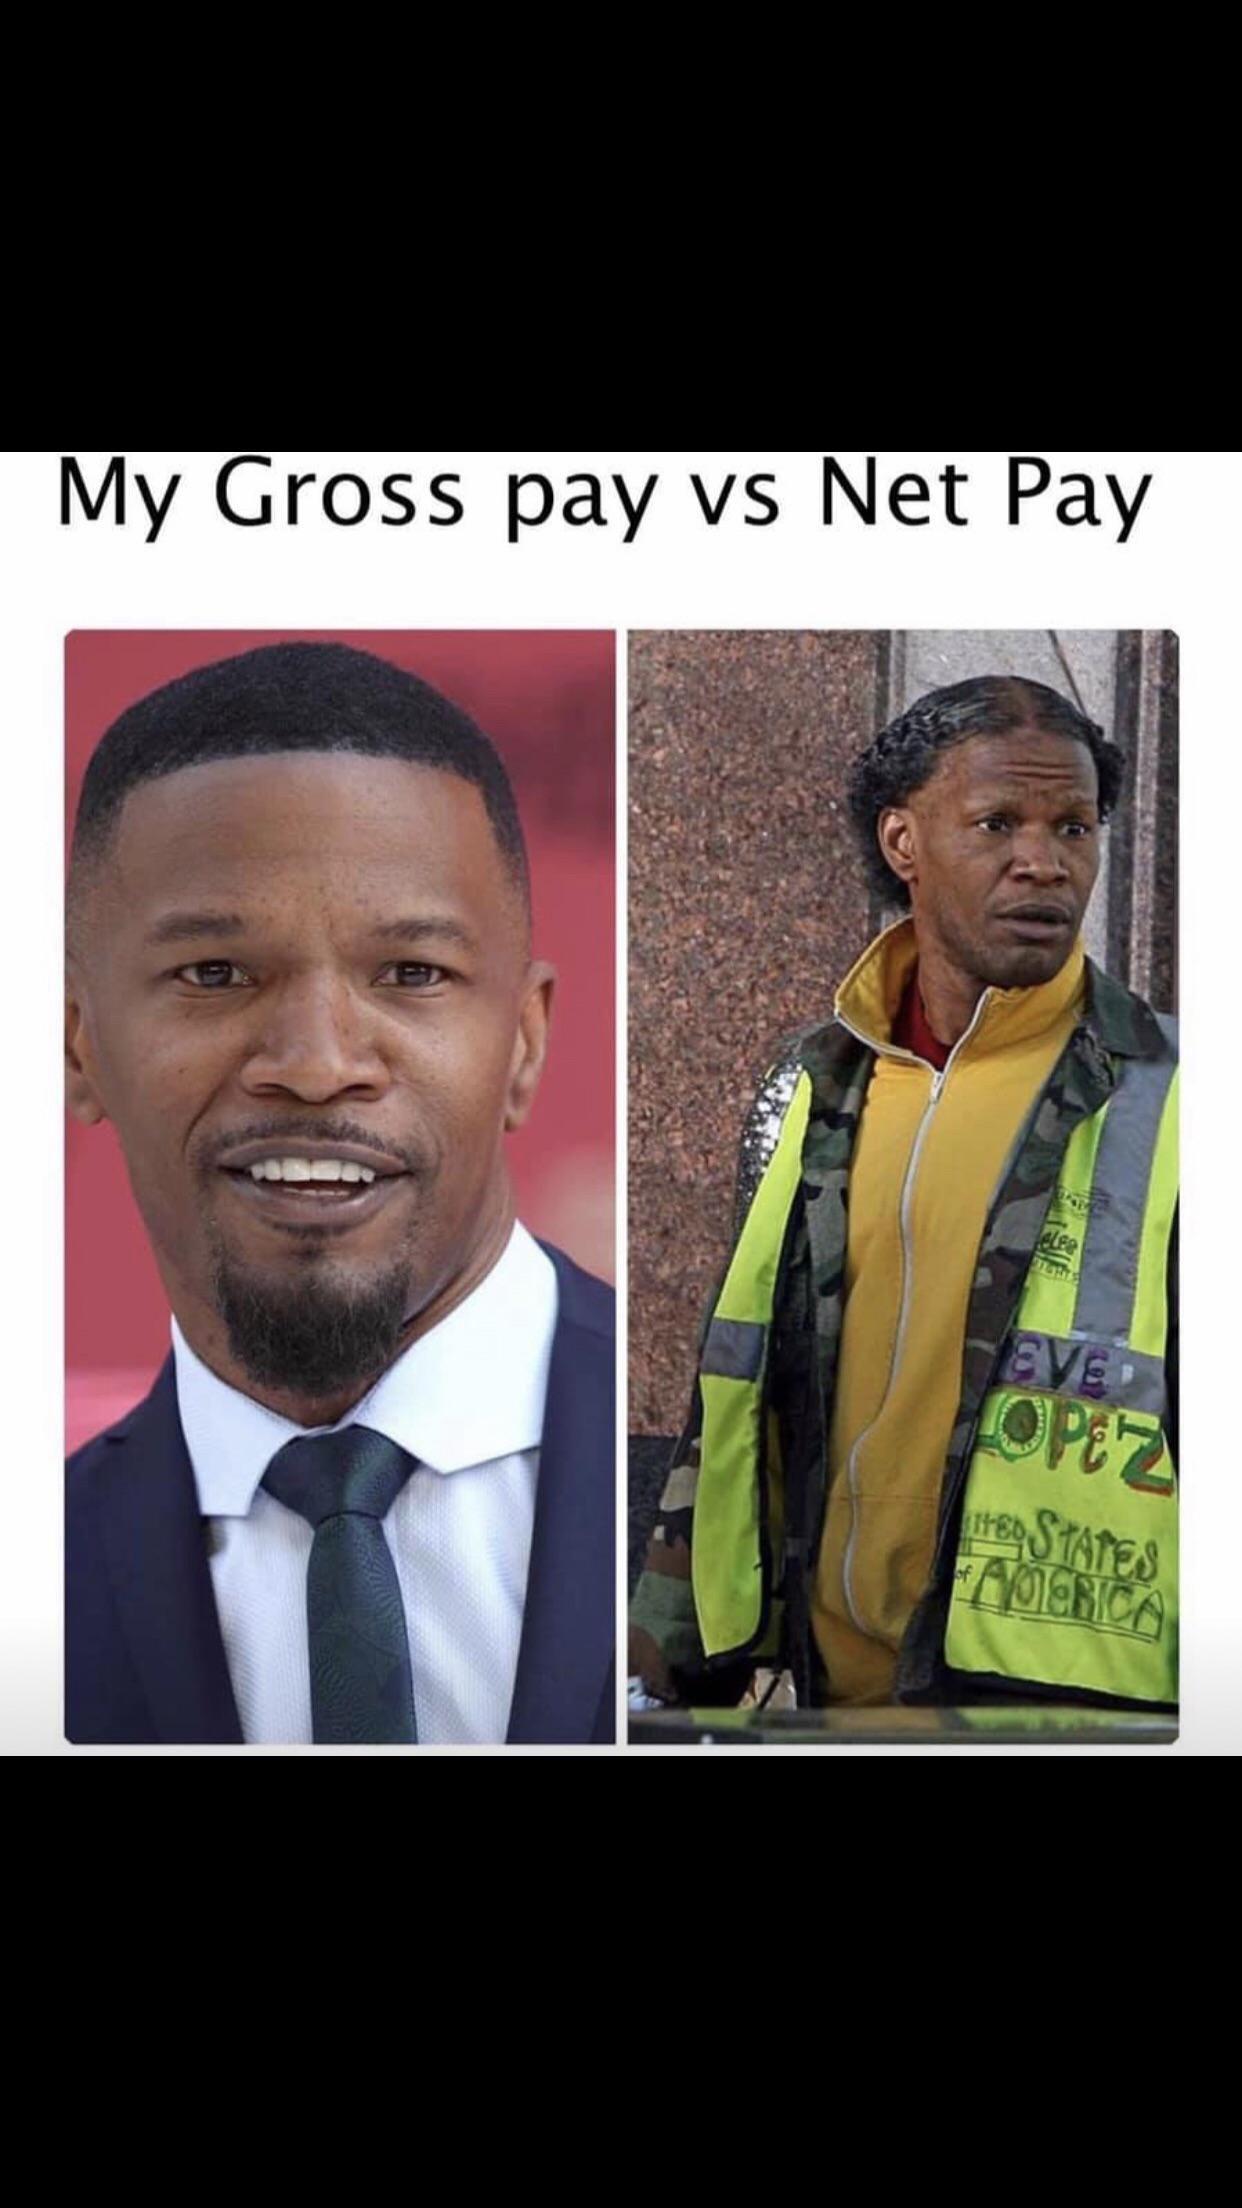 Gross pay vs net pay